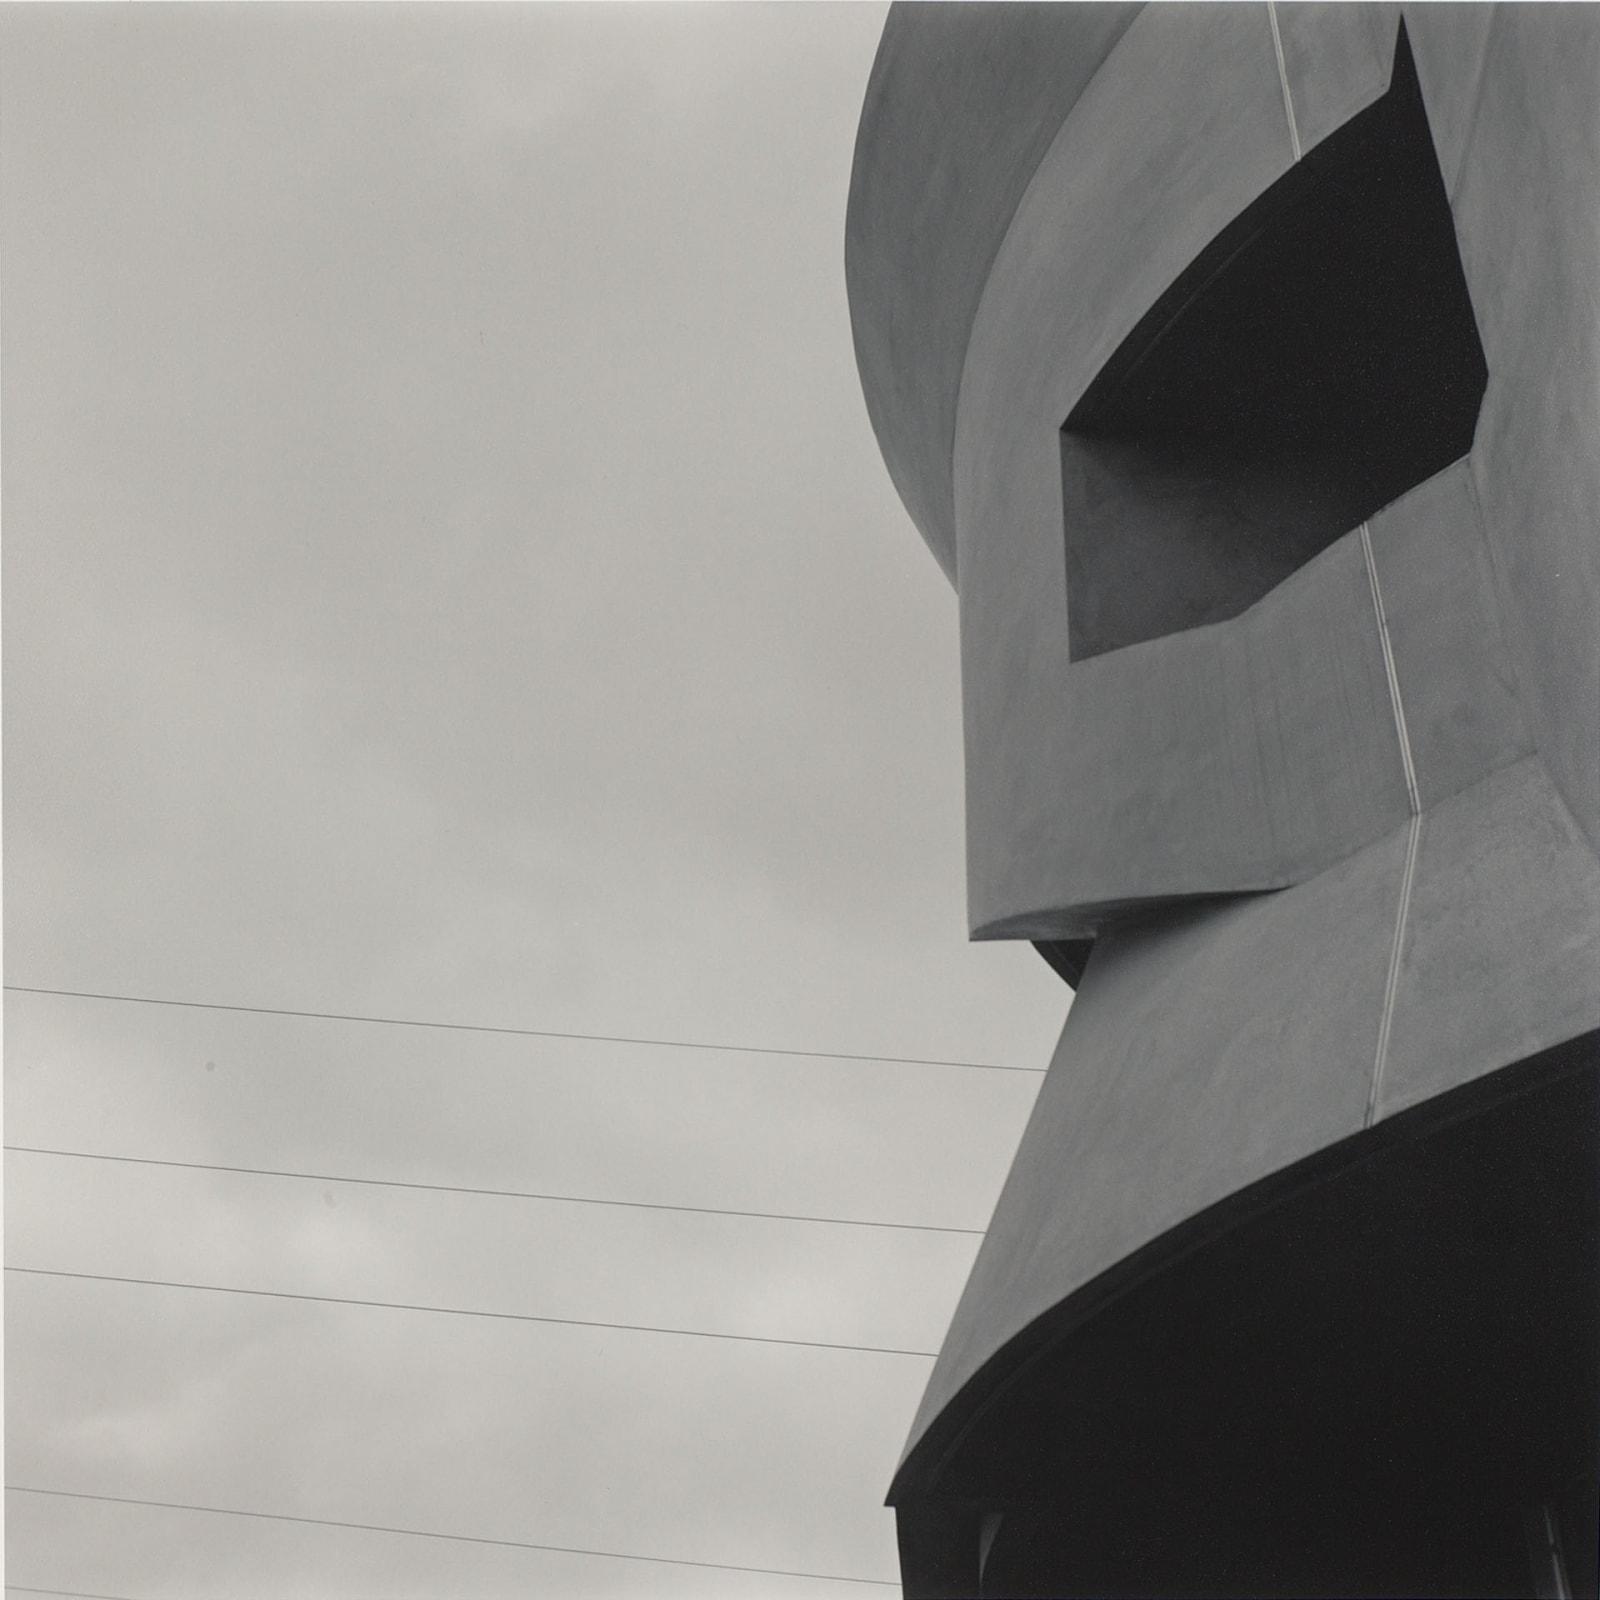 Lynn Davis, Samitaur, Culver City, CA, 1999